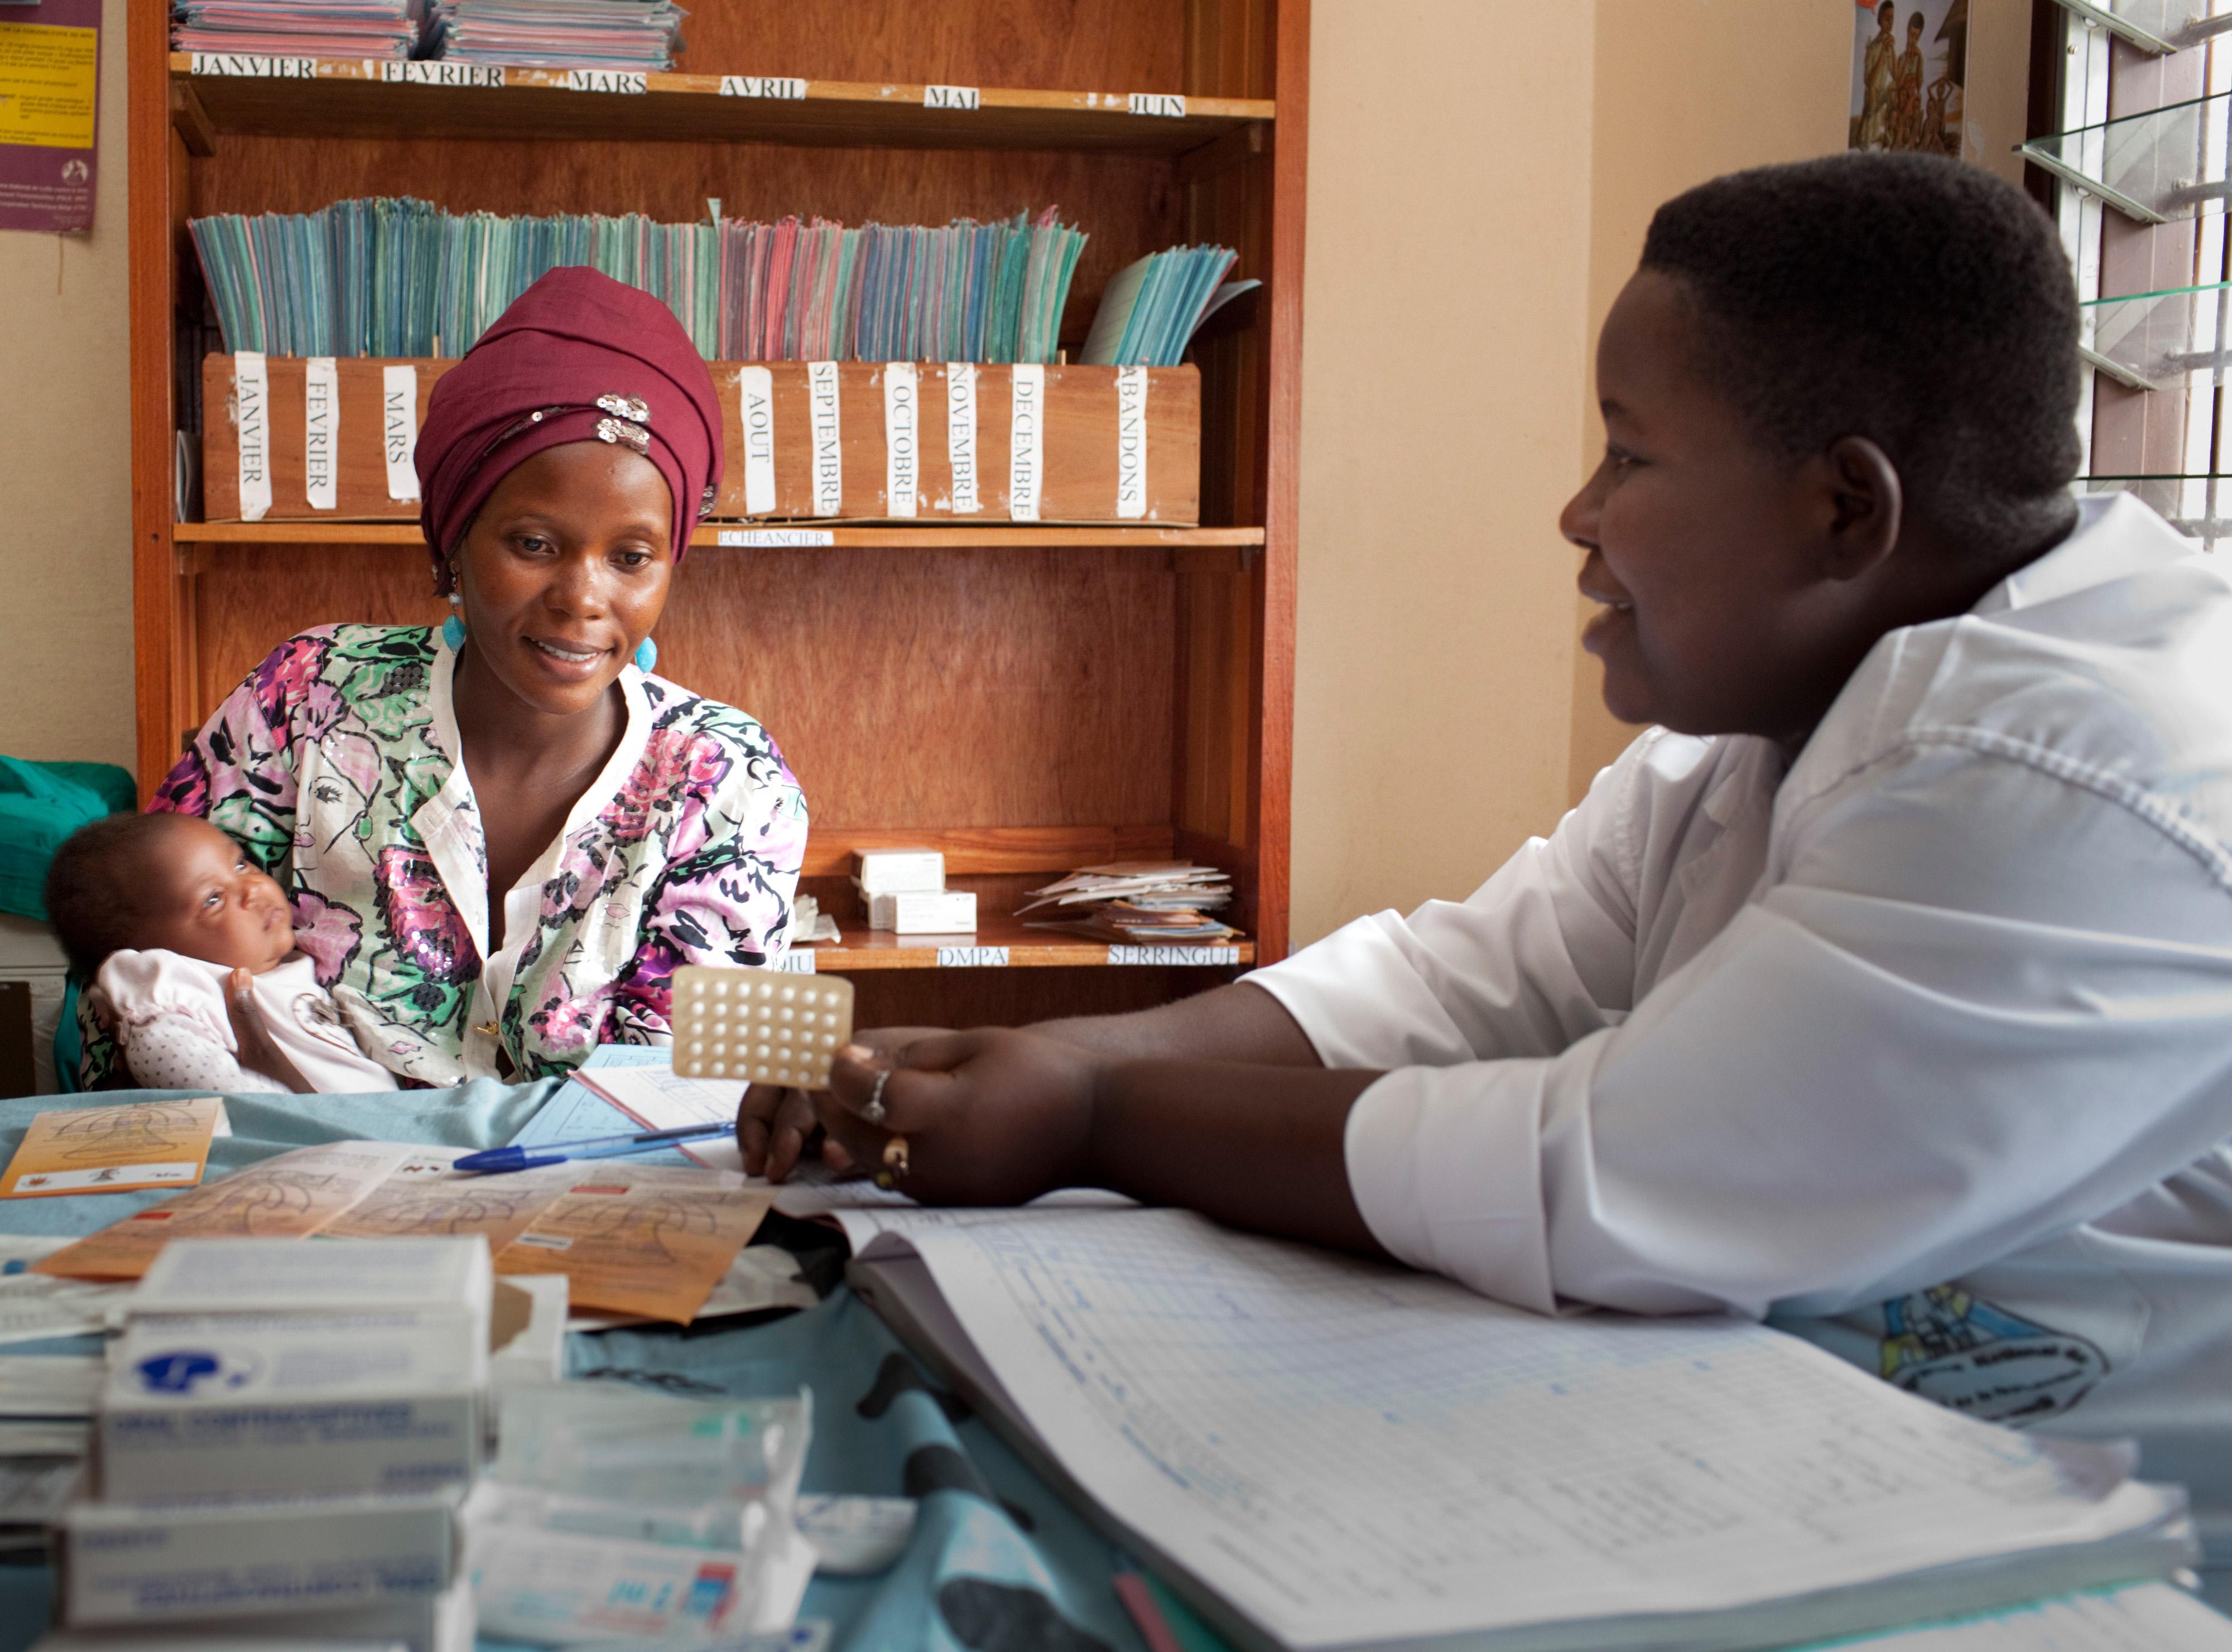 Verhütungsmittel-Beratung in einer Gesundheitsstation in Bujumbura, Burundi.